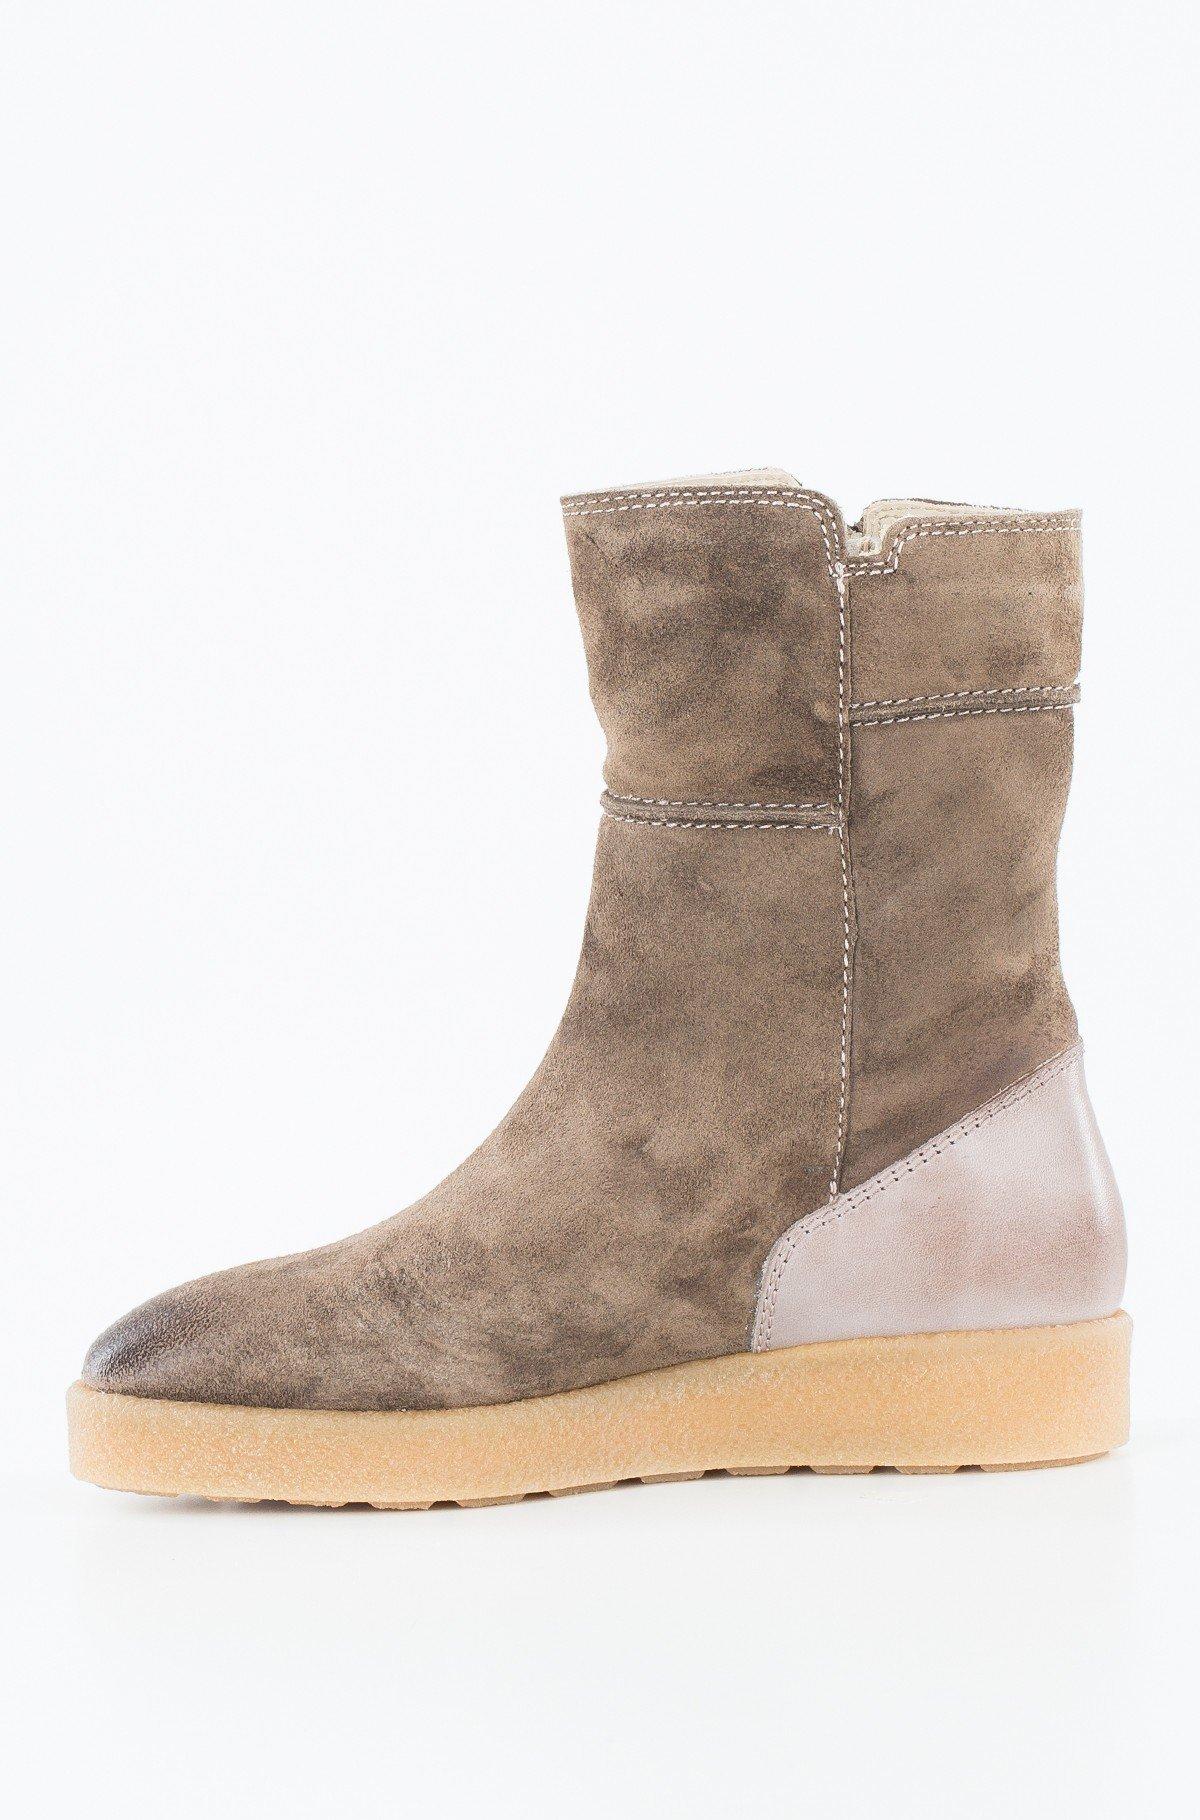 Boots 709 14296001 304-full-2